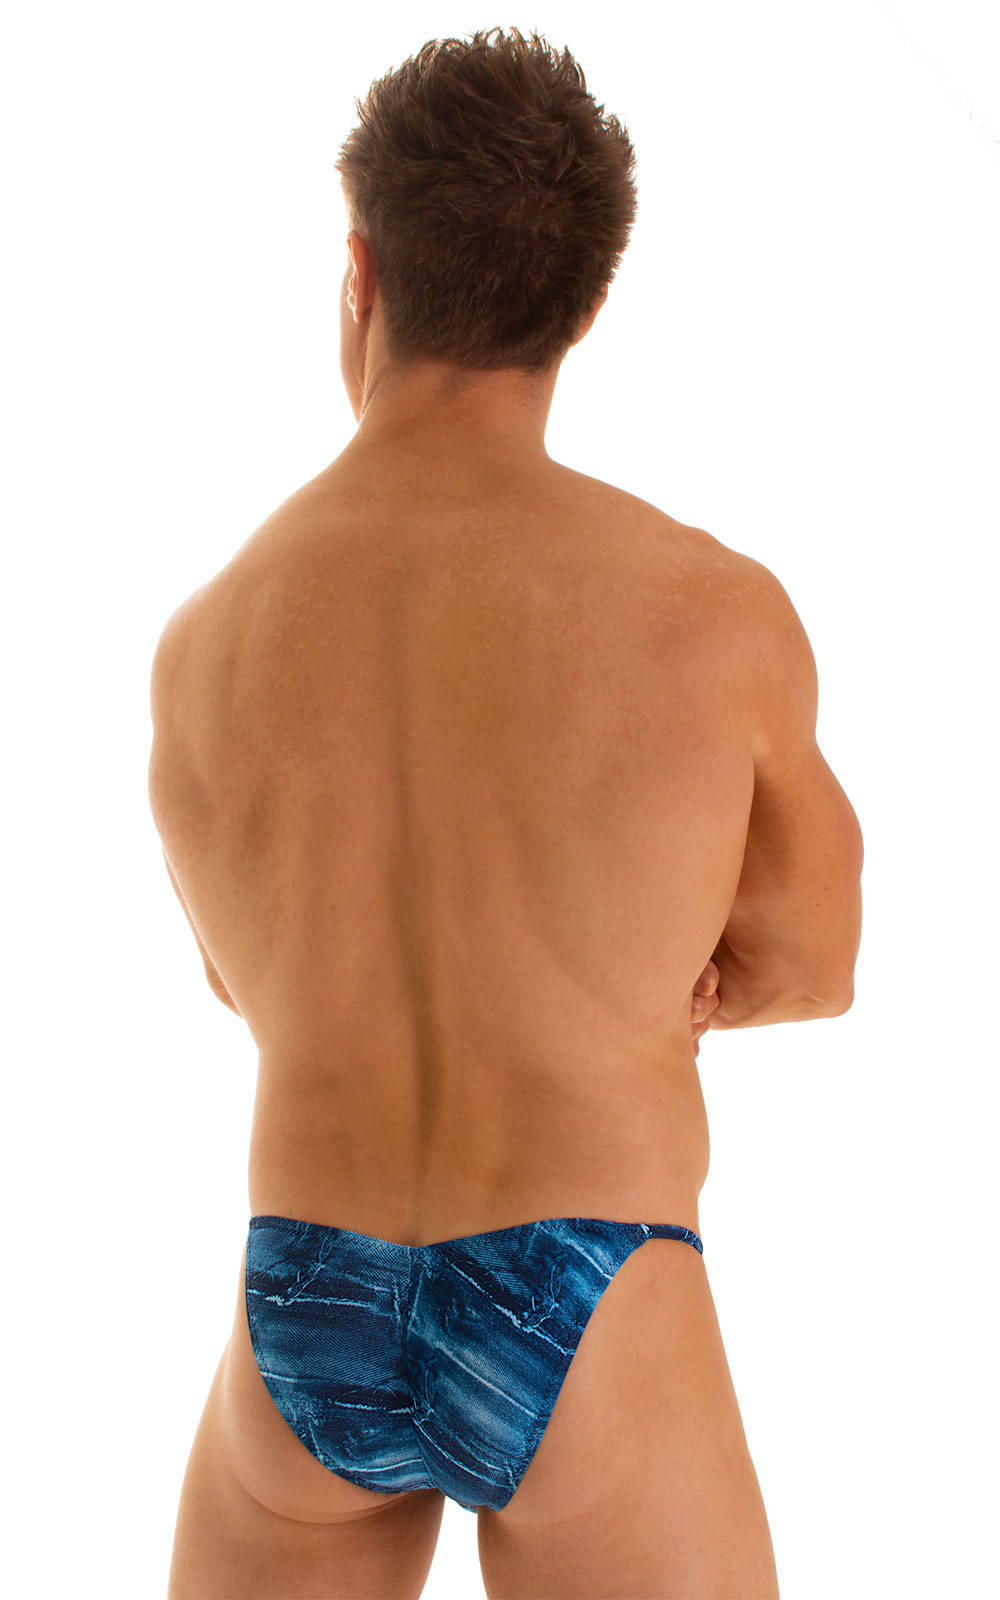 Micro Pouch - Puckered Back - Rio Bikini in Super ThinSkinz Denim Patches 2